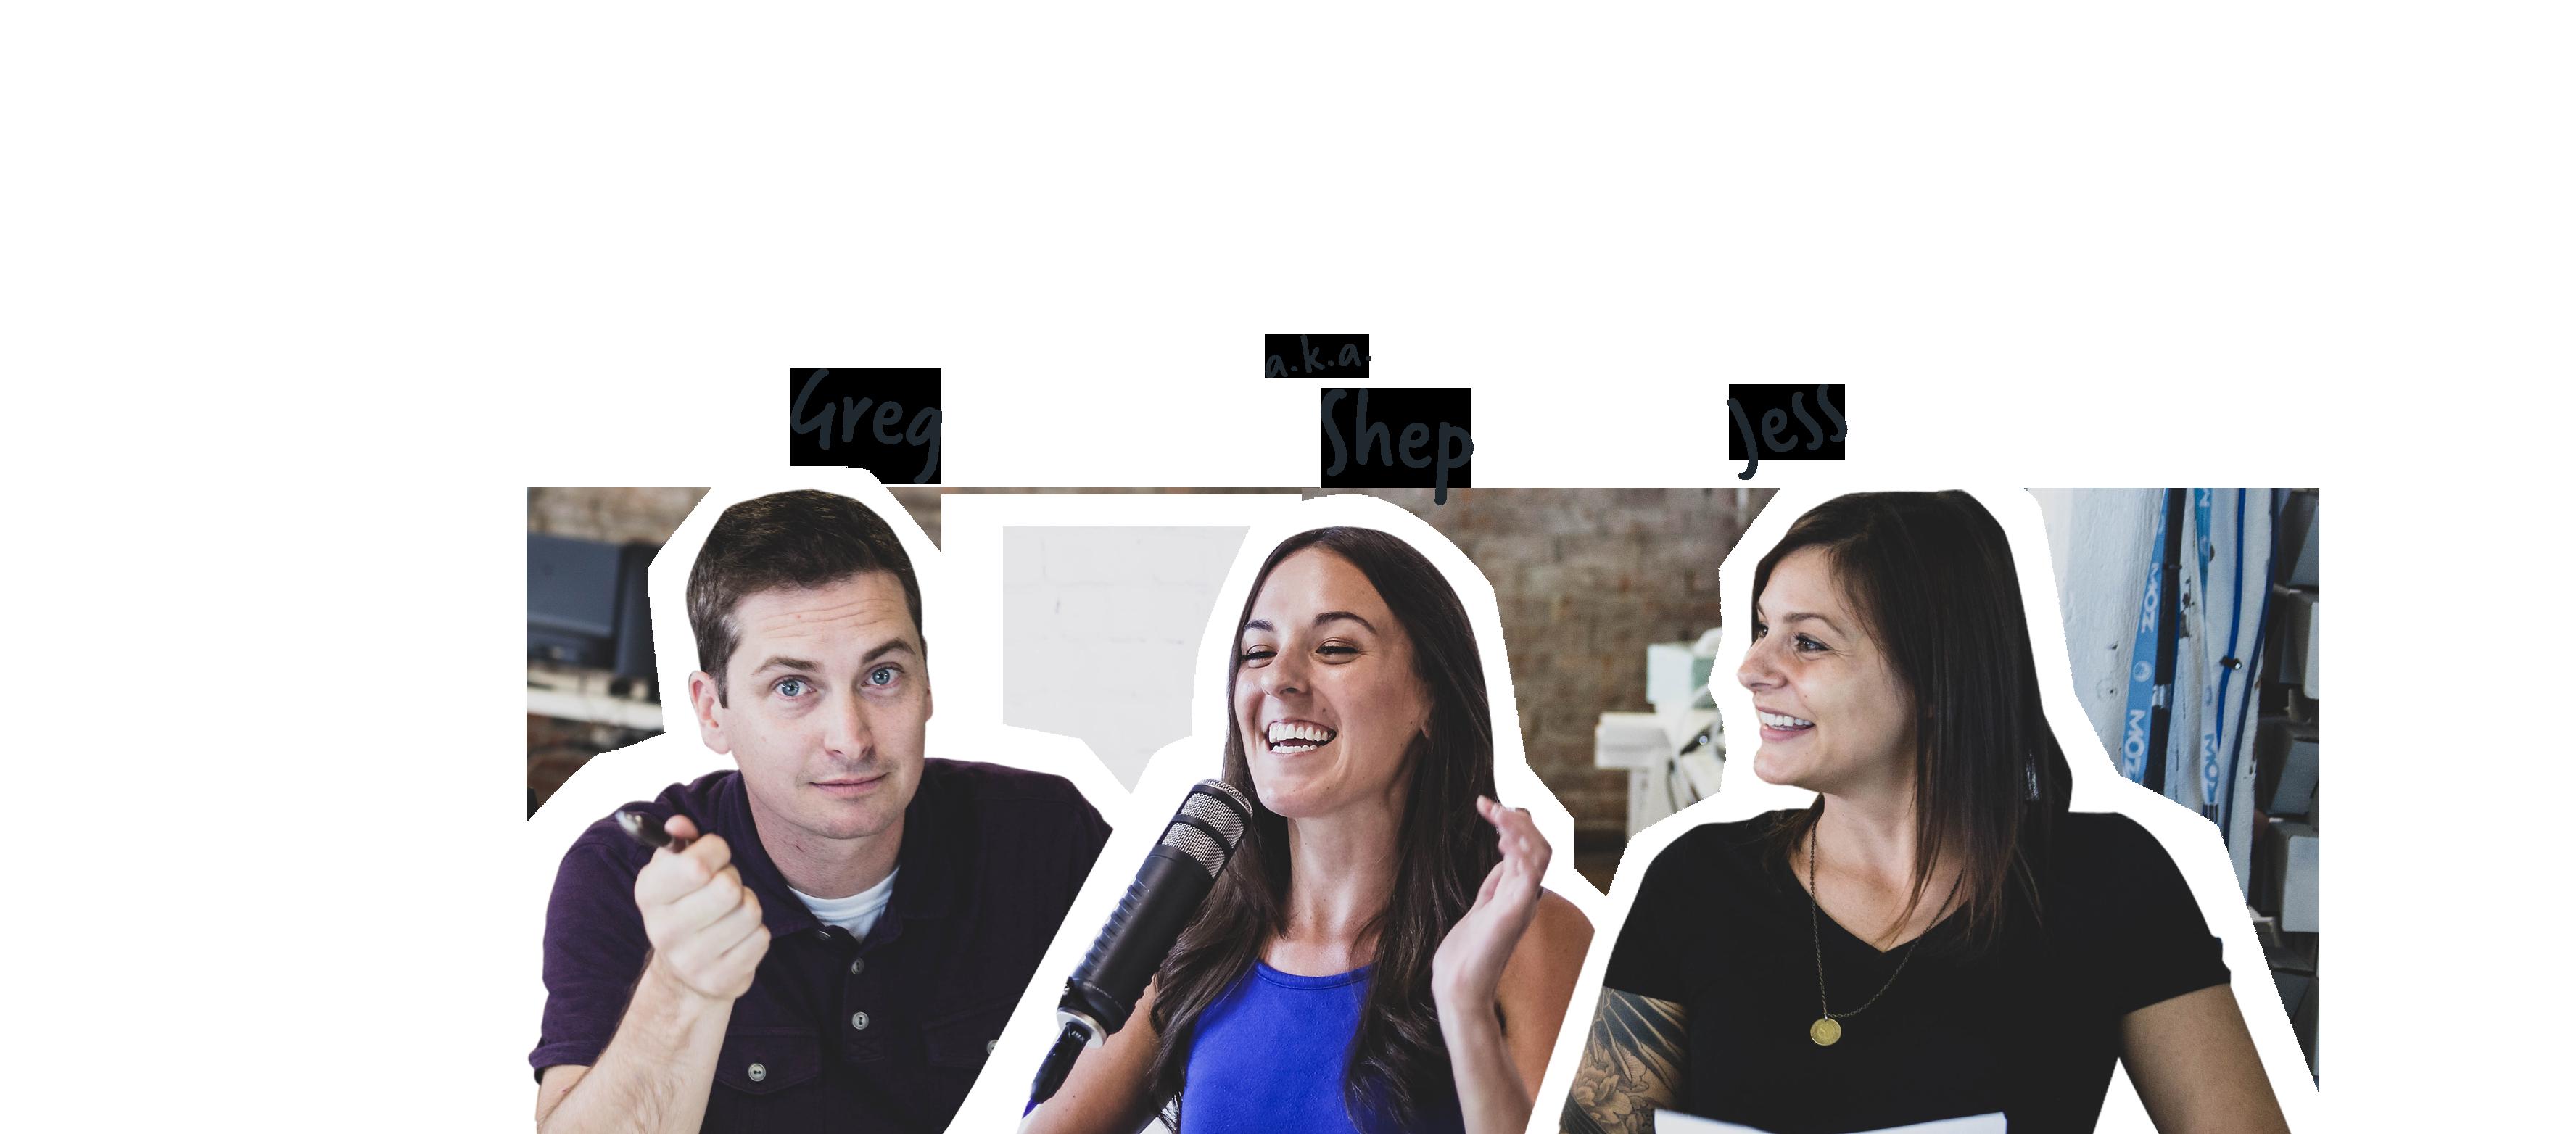 Greg, Hope, Shep and Jess from MarketingO'Clock